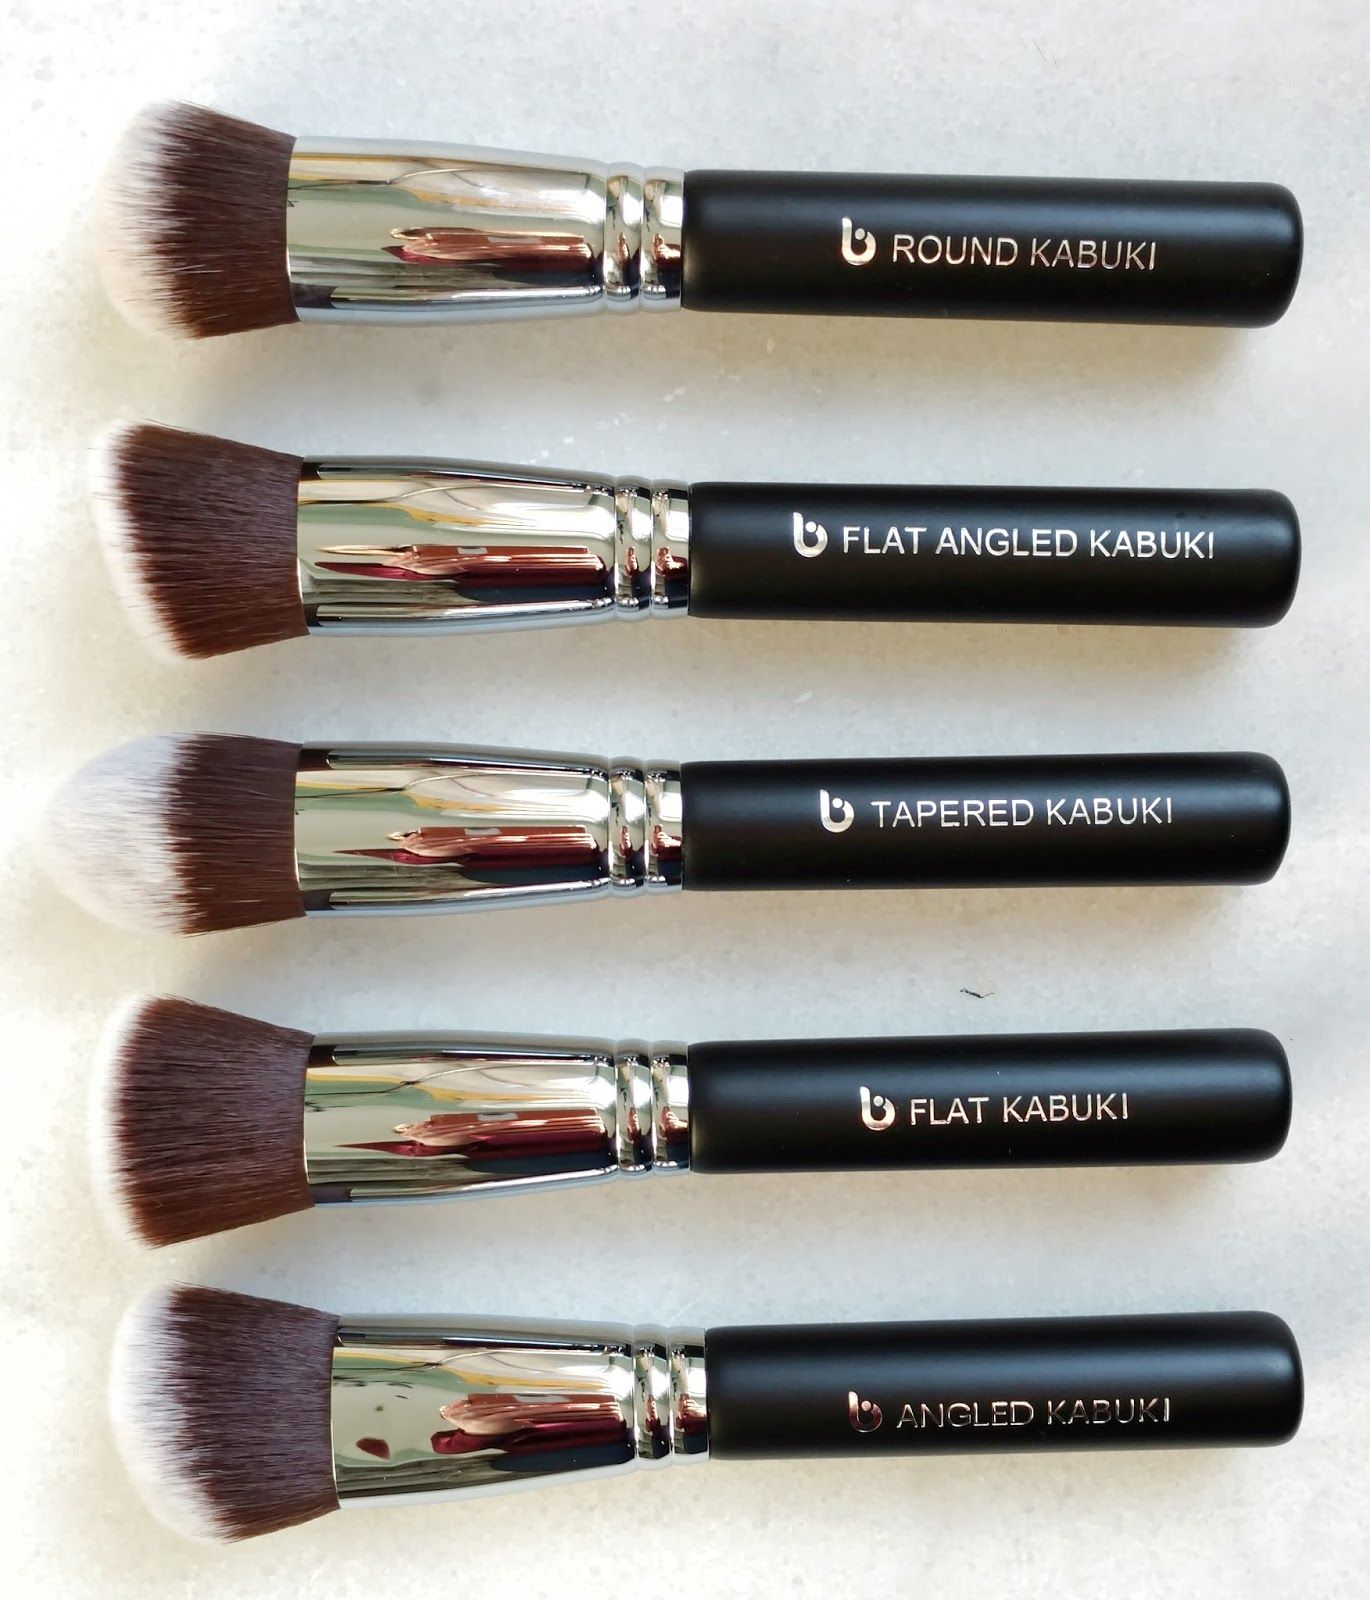 Beauty Junkees Kabuki Brush Set Review Kabuki brush set